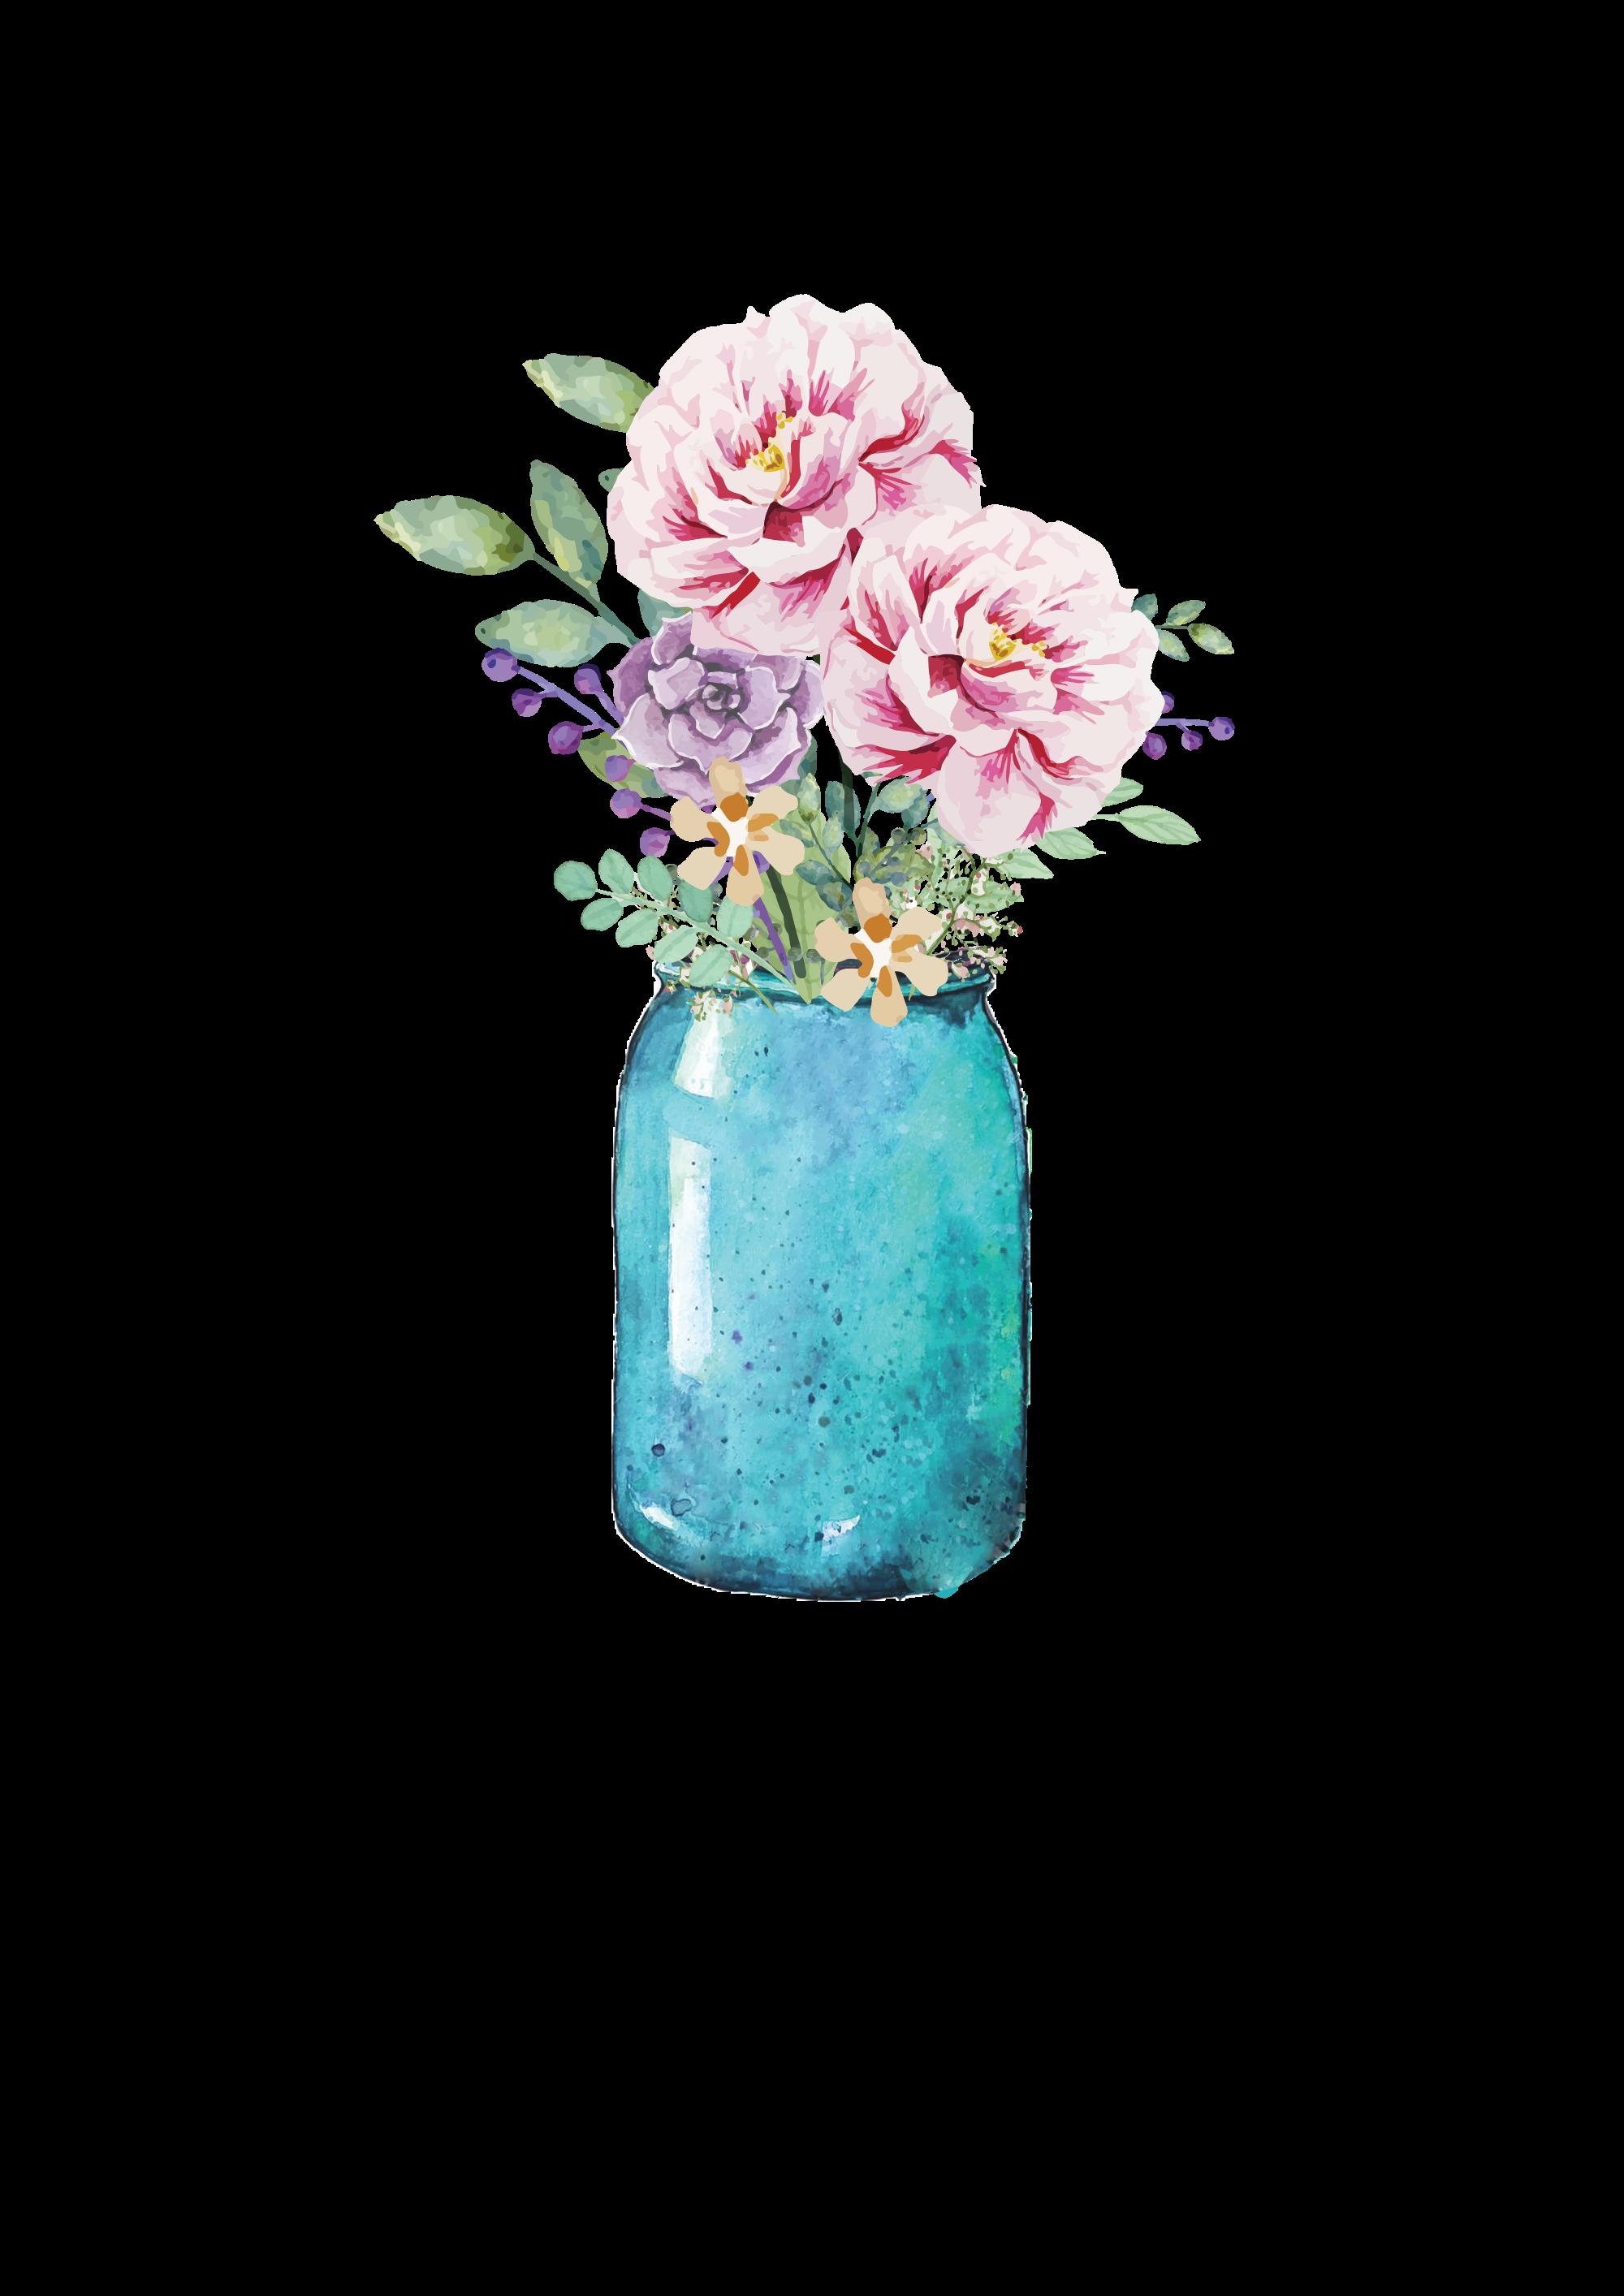 Rustic Mason Jar Fall Iphone Wallpaper Lauren Baxter Flowers In A Mason Jar Imprimibles